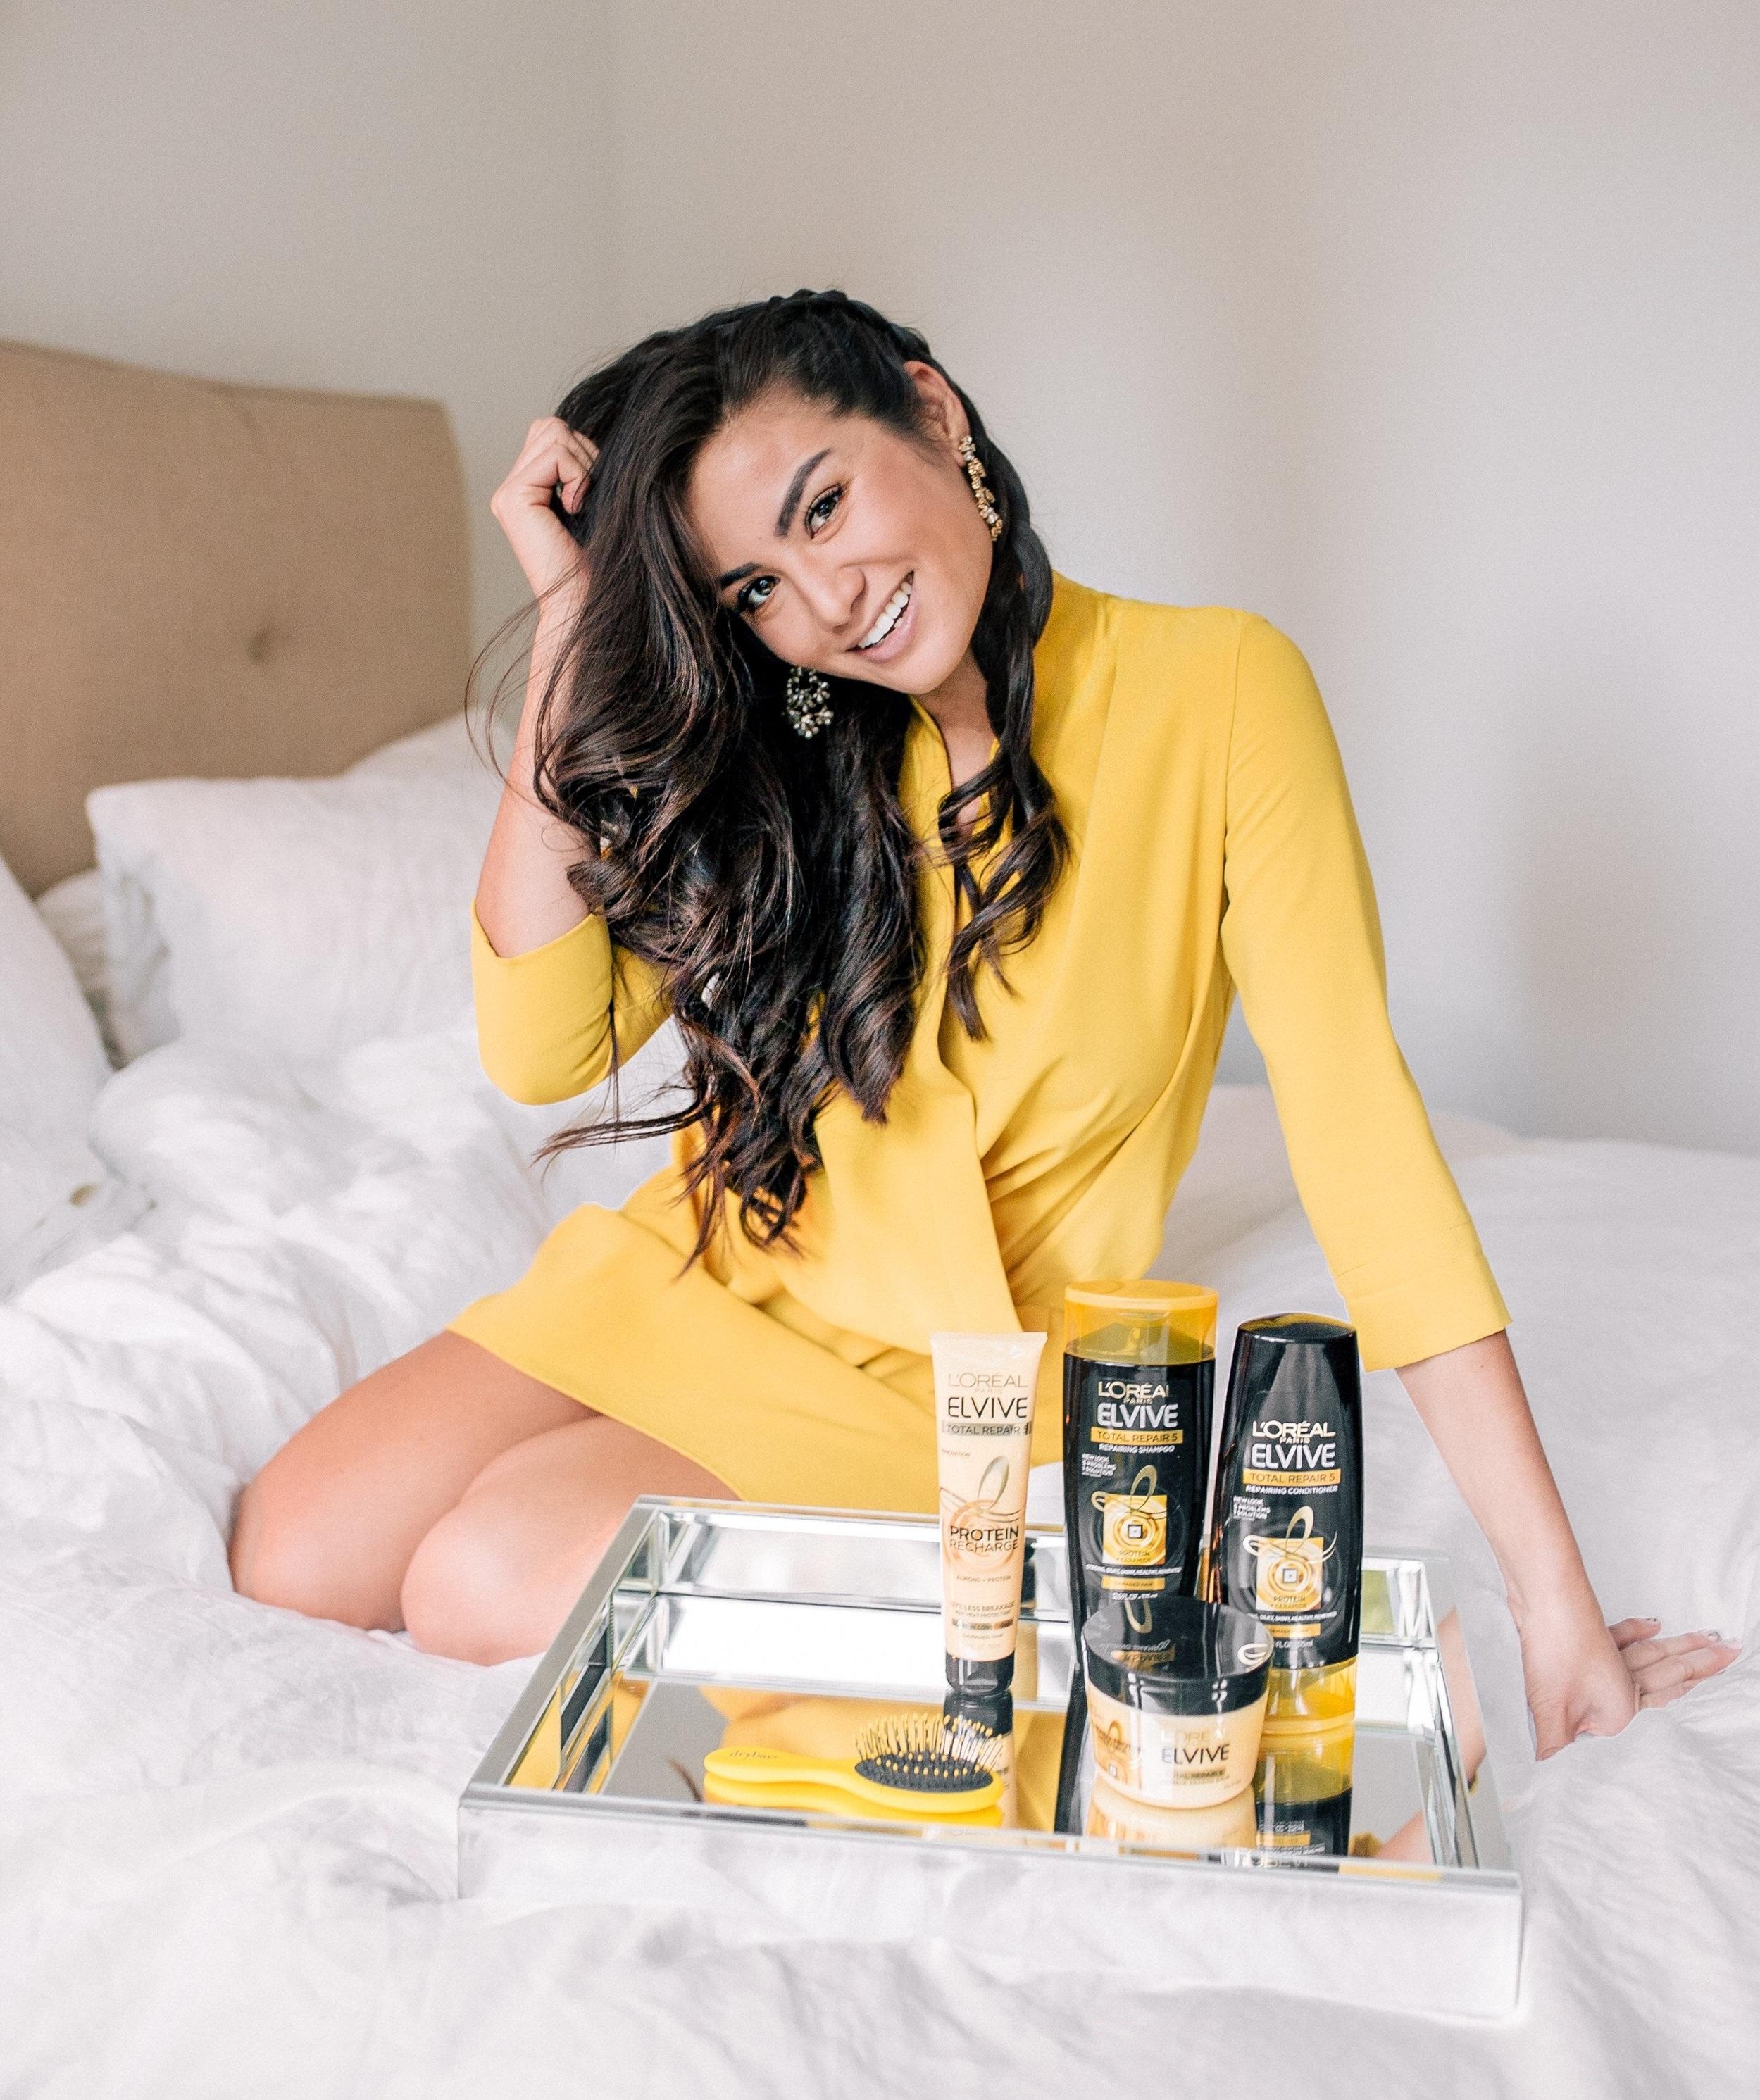 Caila Quinn The Bachelor Hair Routine Loreal Elvive Shampoo and Conditioner Hapa Filipino Irish Curls